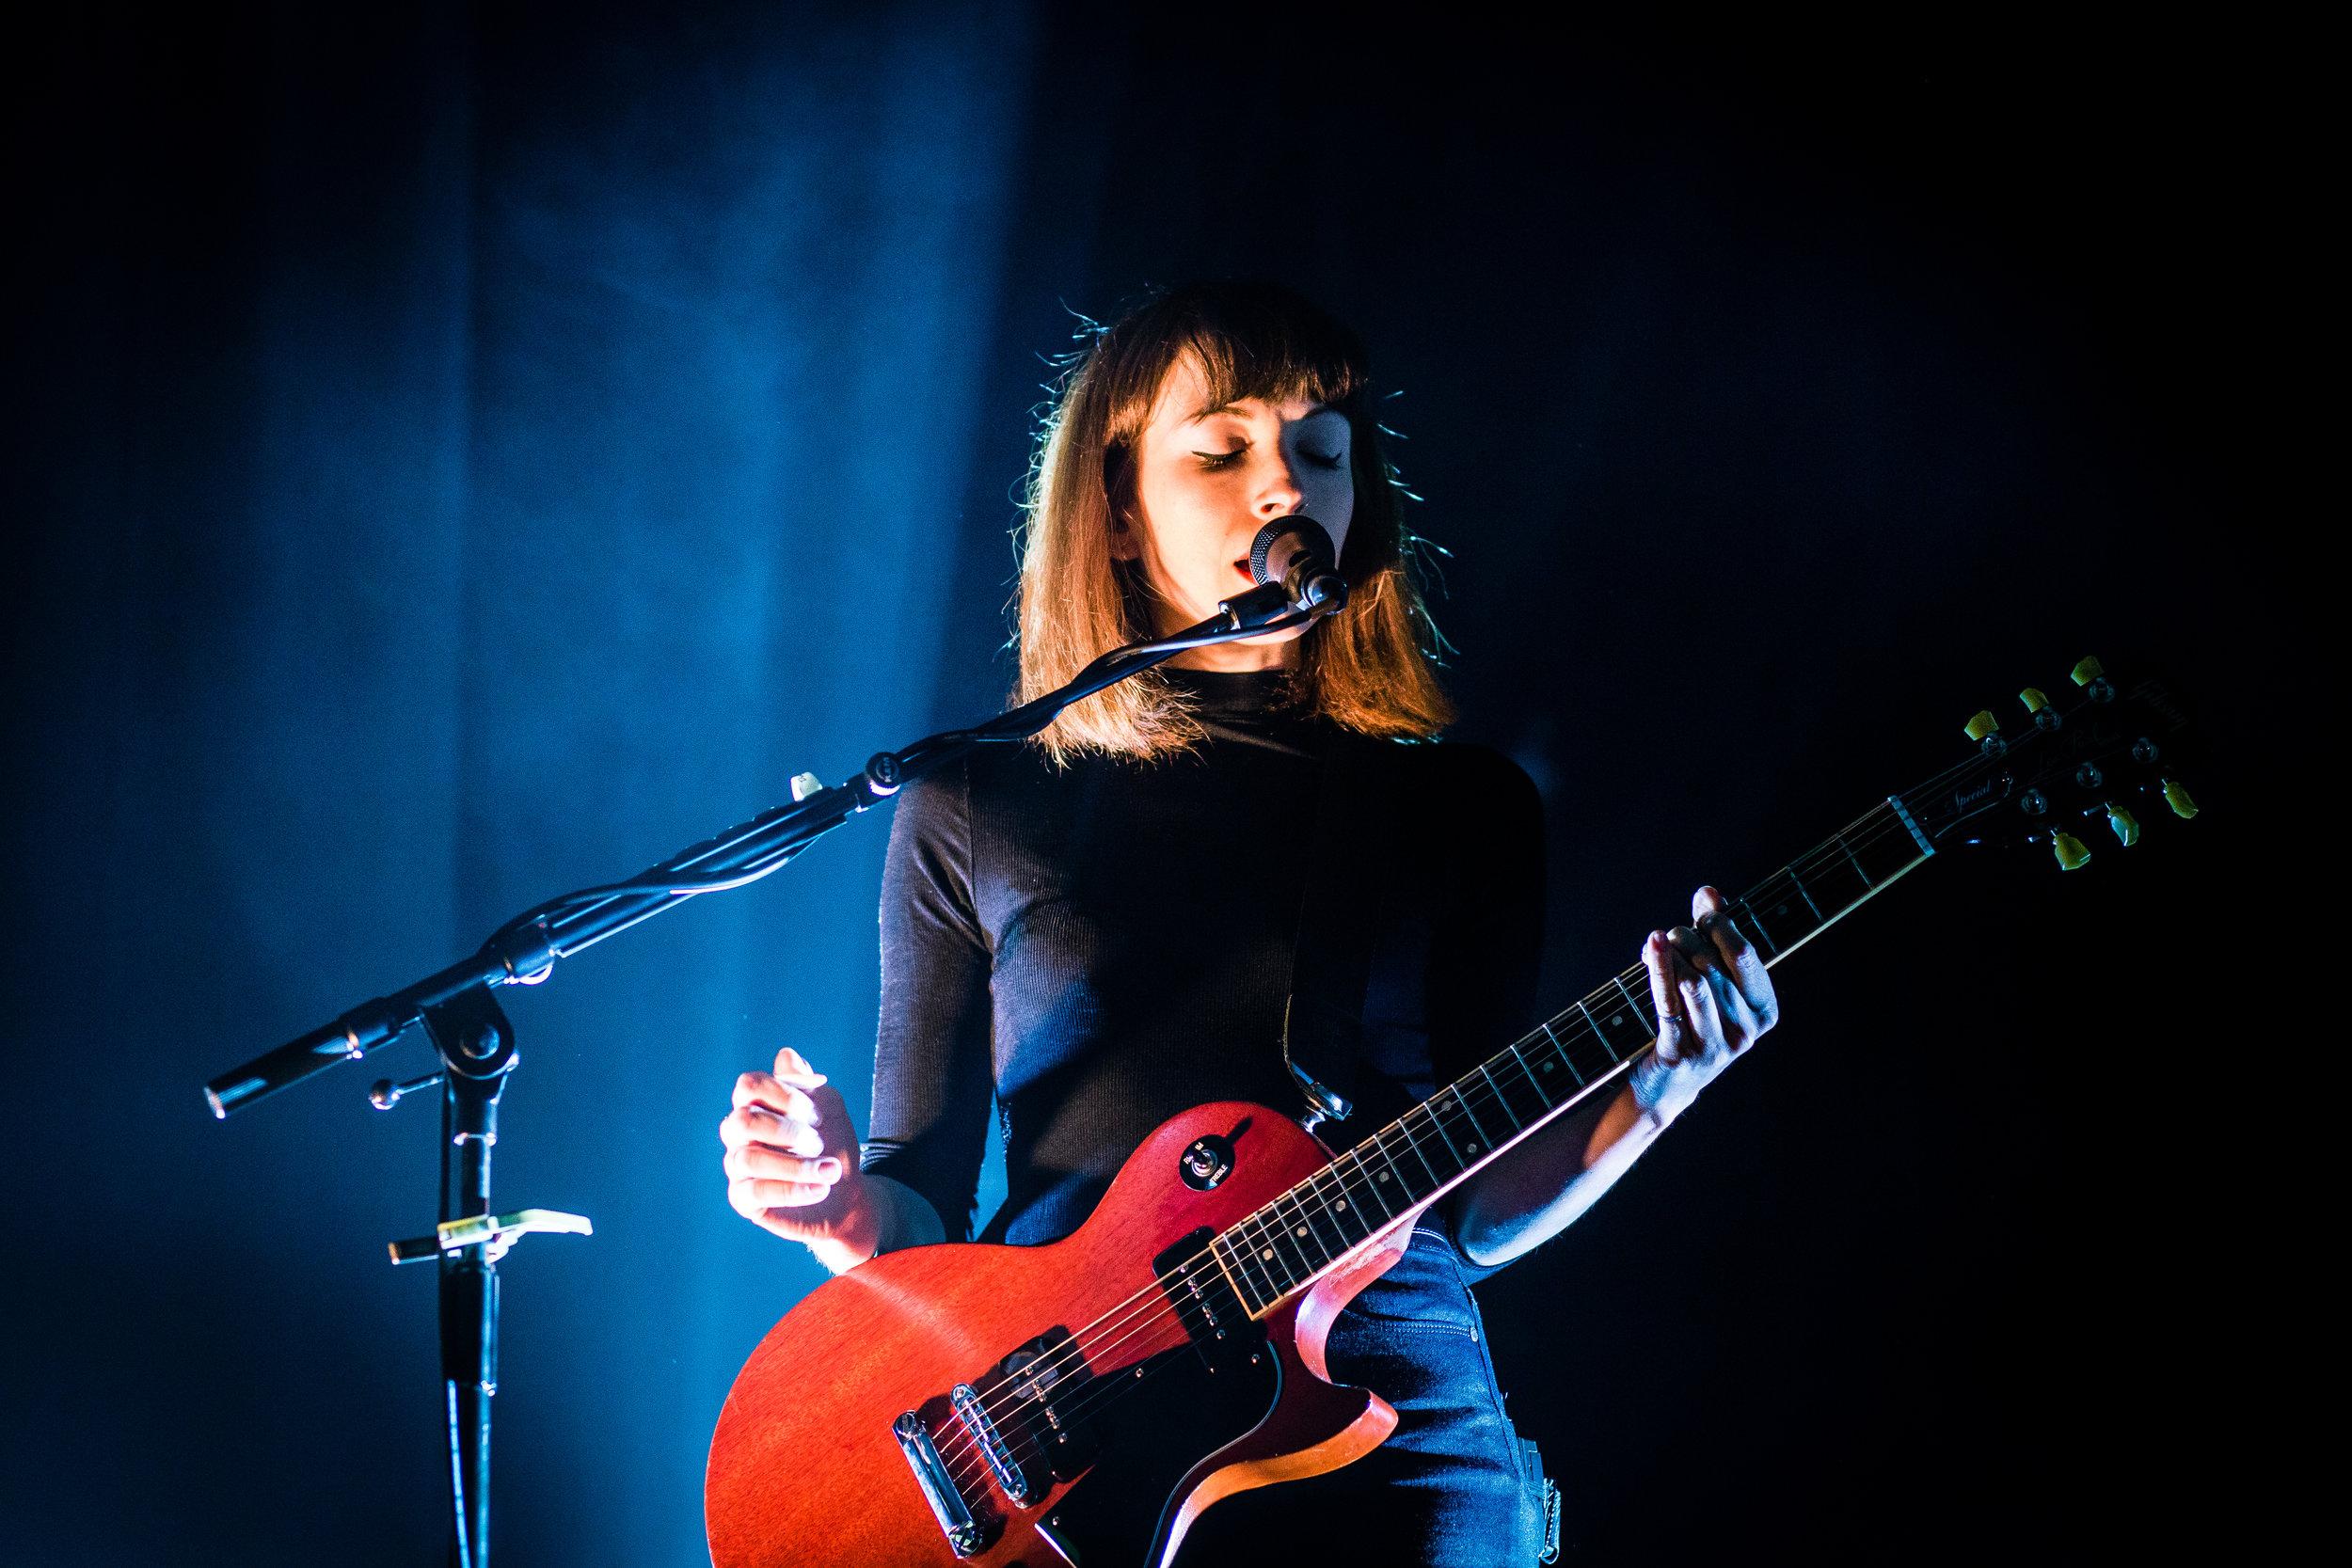 Daughter @ O2 Academy, Glasgow // photograph by Calum McMillan